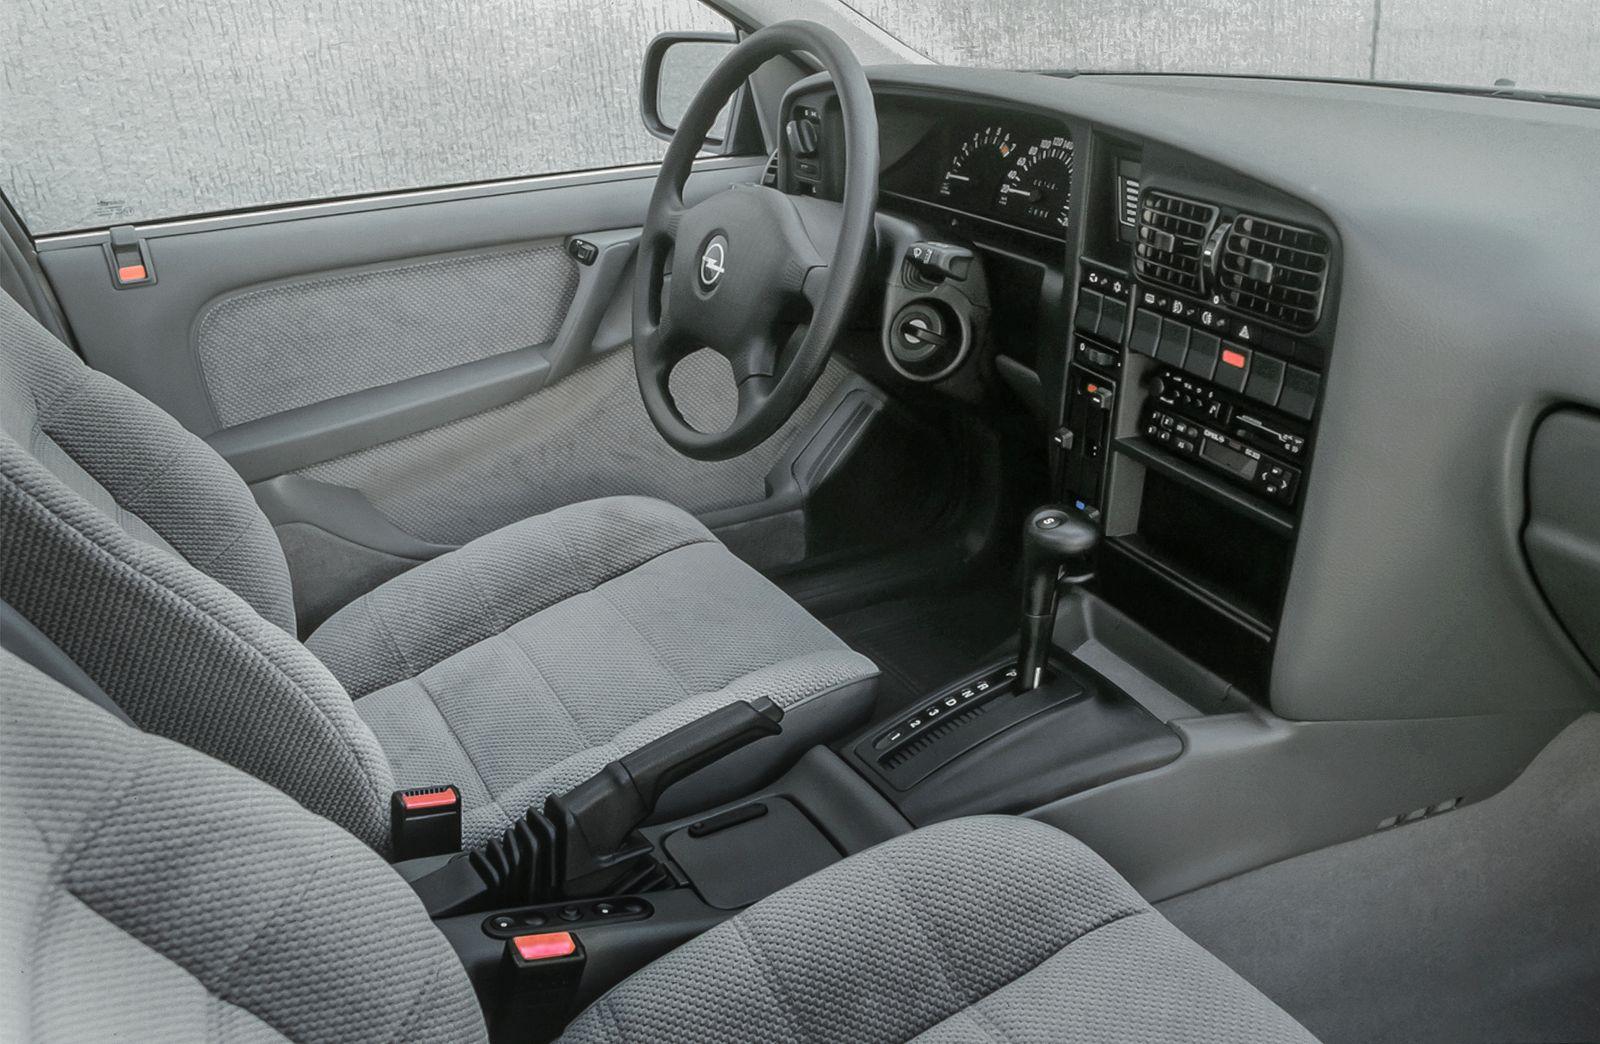 Opel Omega 2.0i CD, 1990